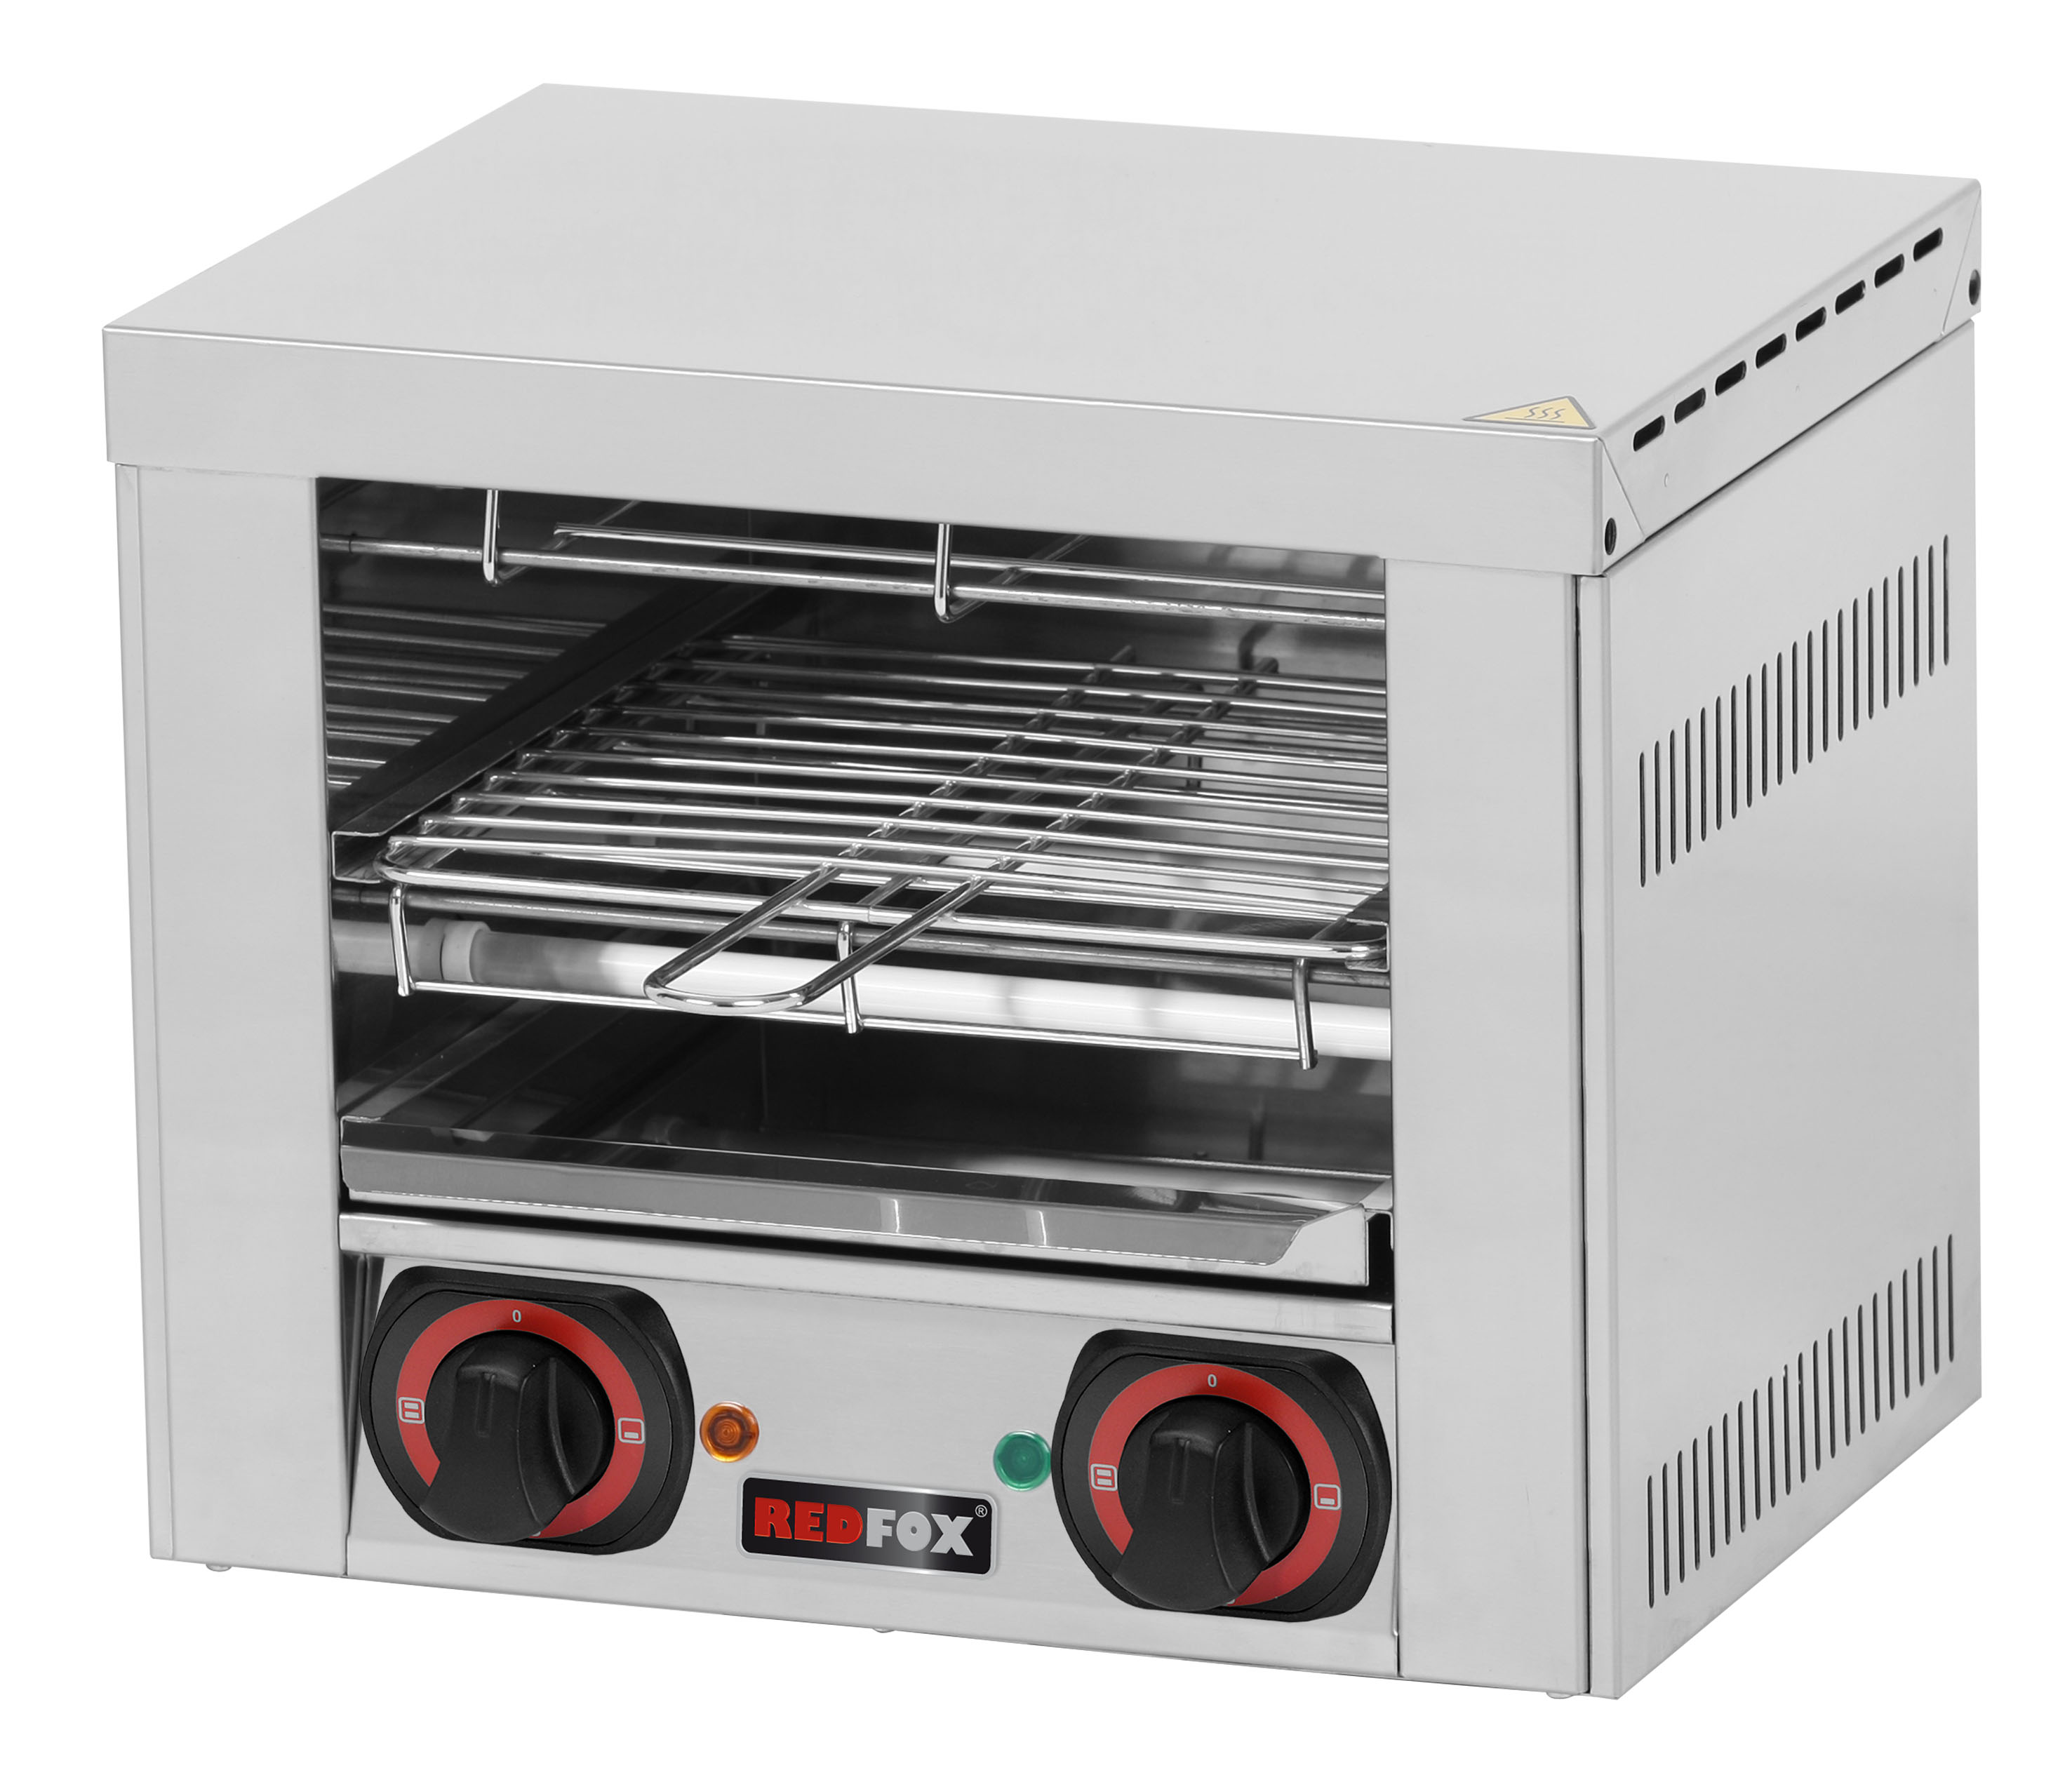 Toaster TO 920 GH 2x kleště, rošt RedFox